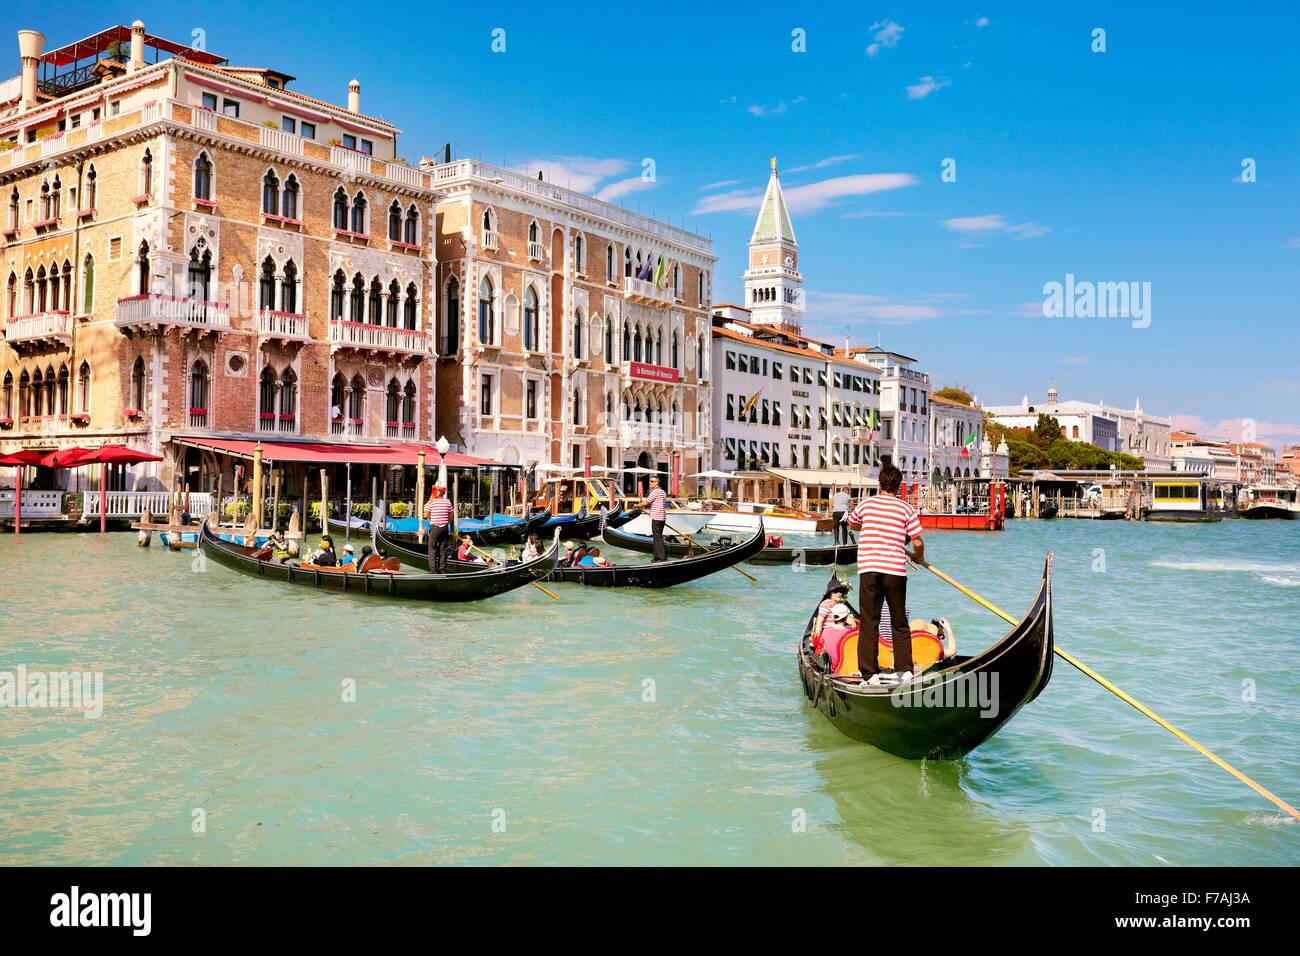 Gondolier flowing gondola, Grand Canal (Canal Grande), Venice, Veneto, Italy, UNESCO - Stock Image